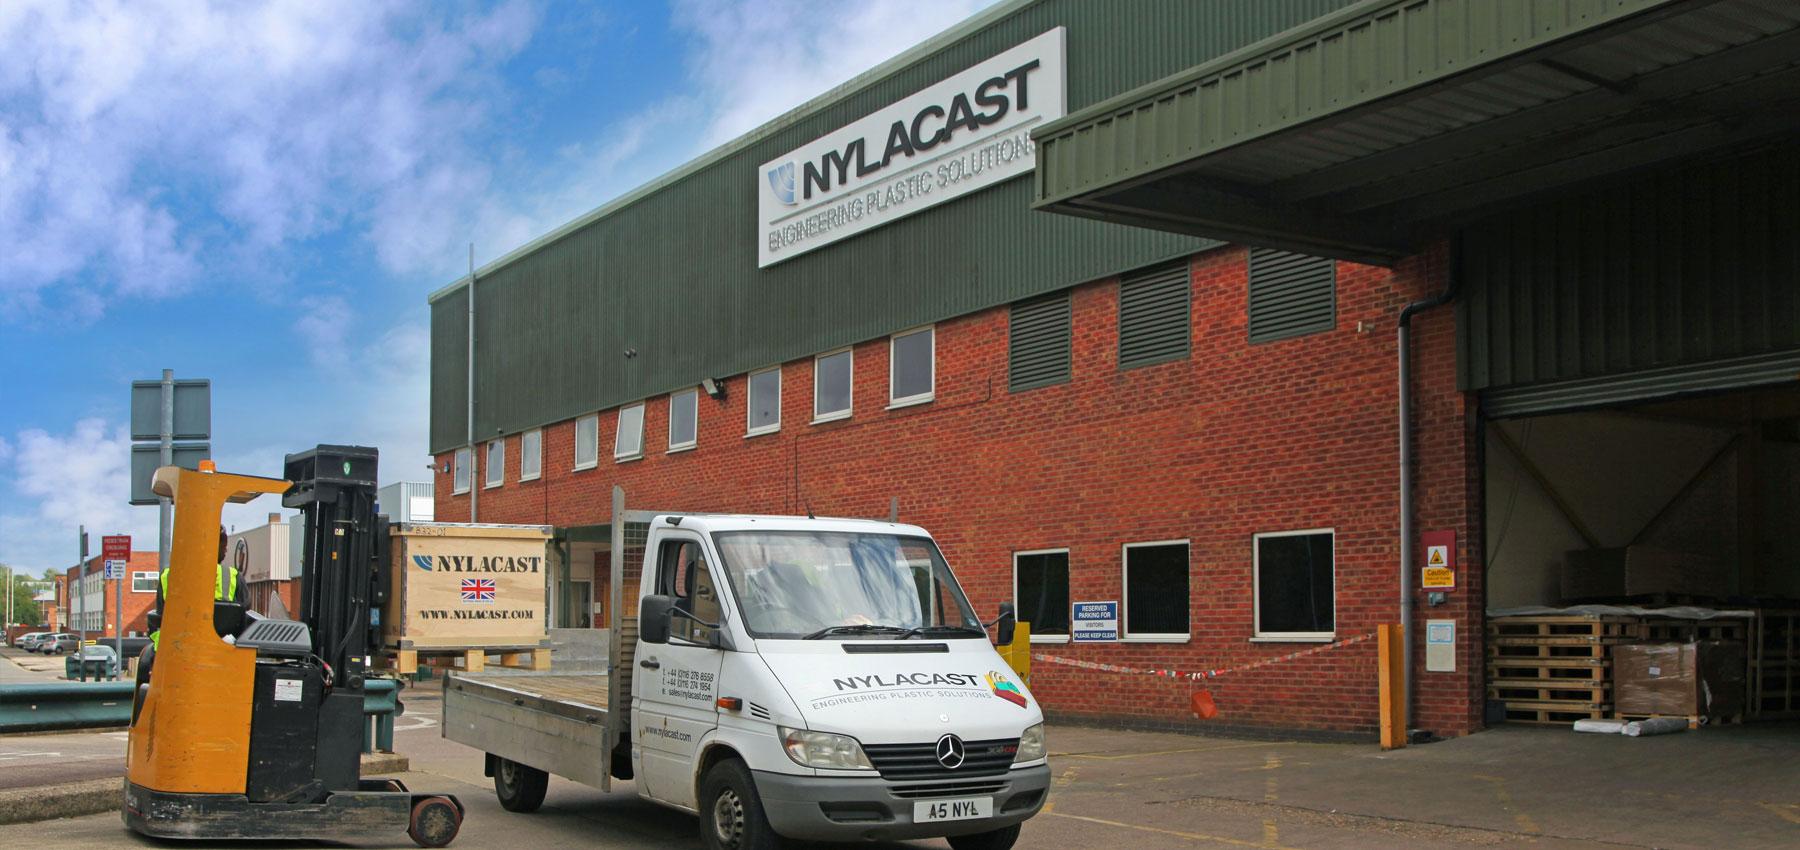 Nylacast Engineering Solutions